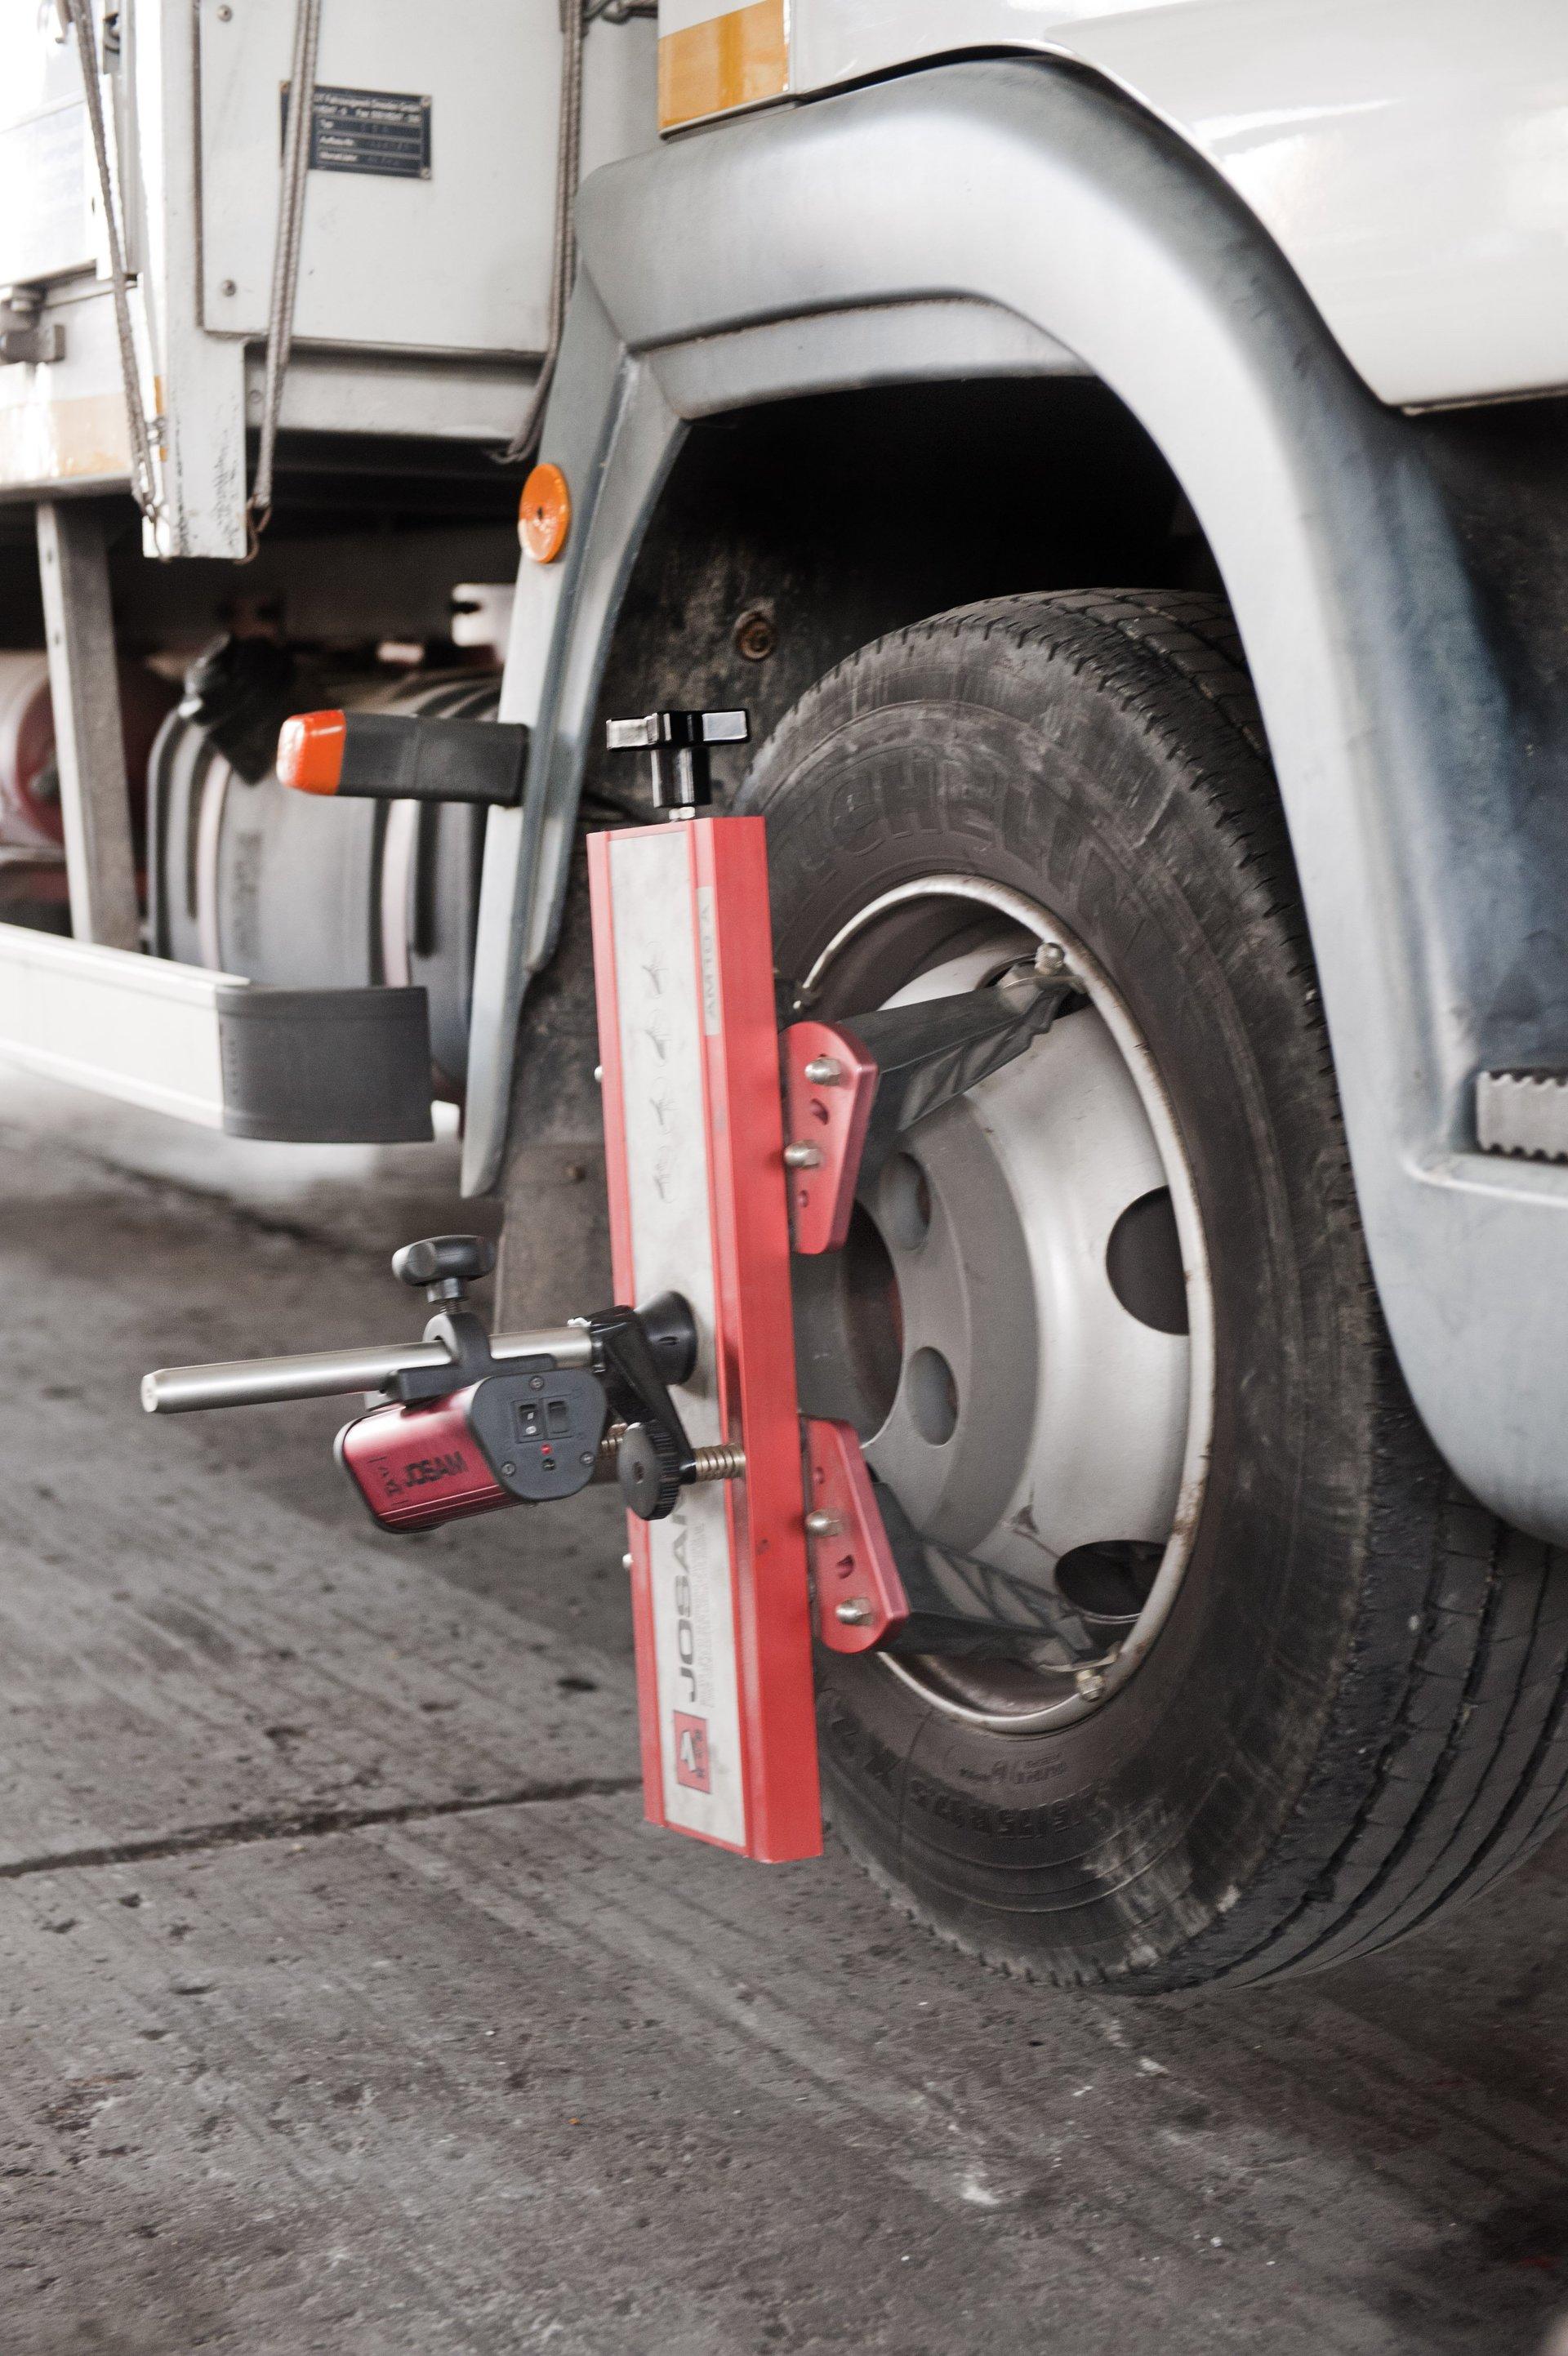 ruota di un camion con crick